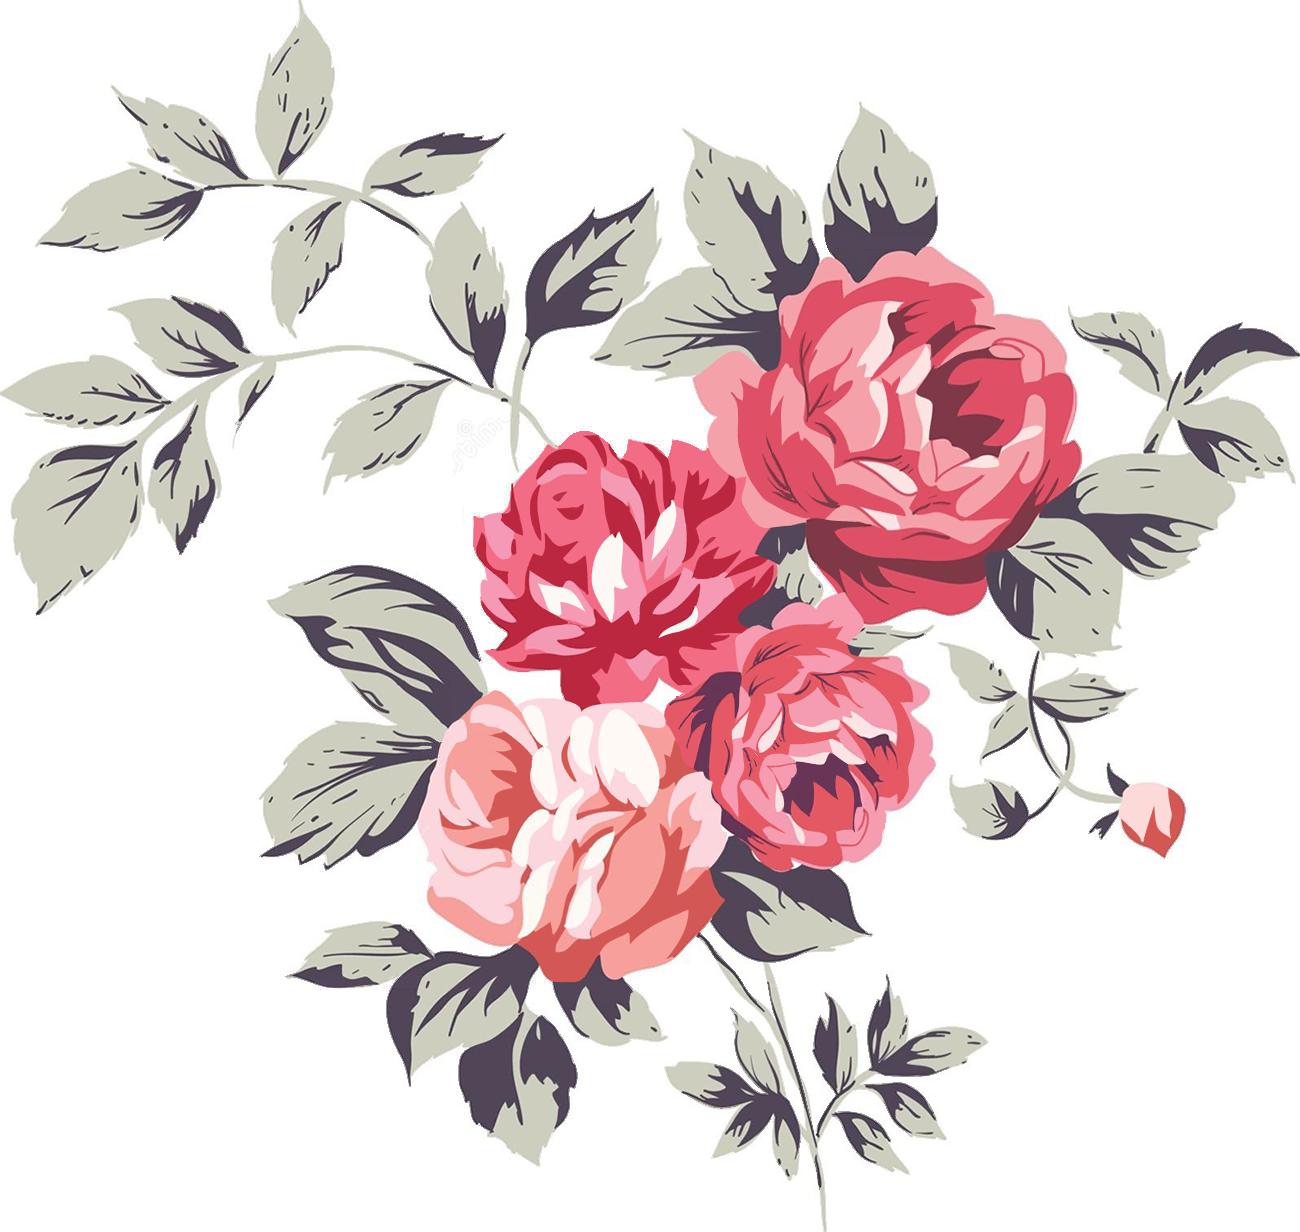 Http D Top4top Net P 31jswt2 Png Vintage Flower Tattoo Vintage Flowers Vintage Roses